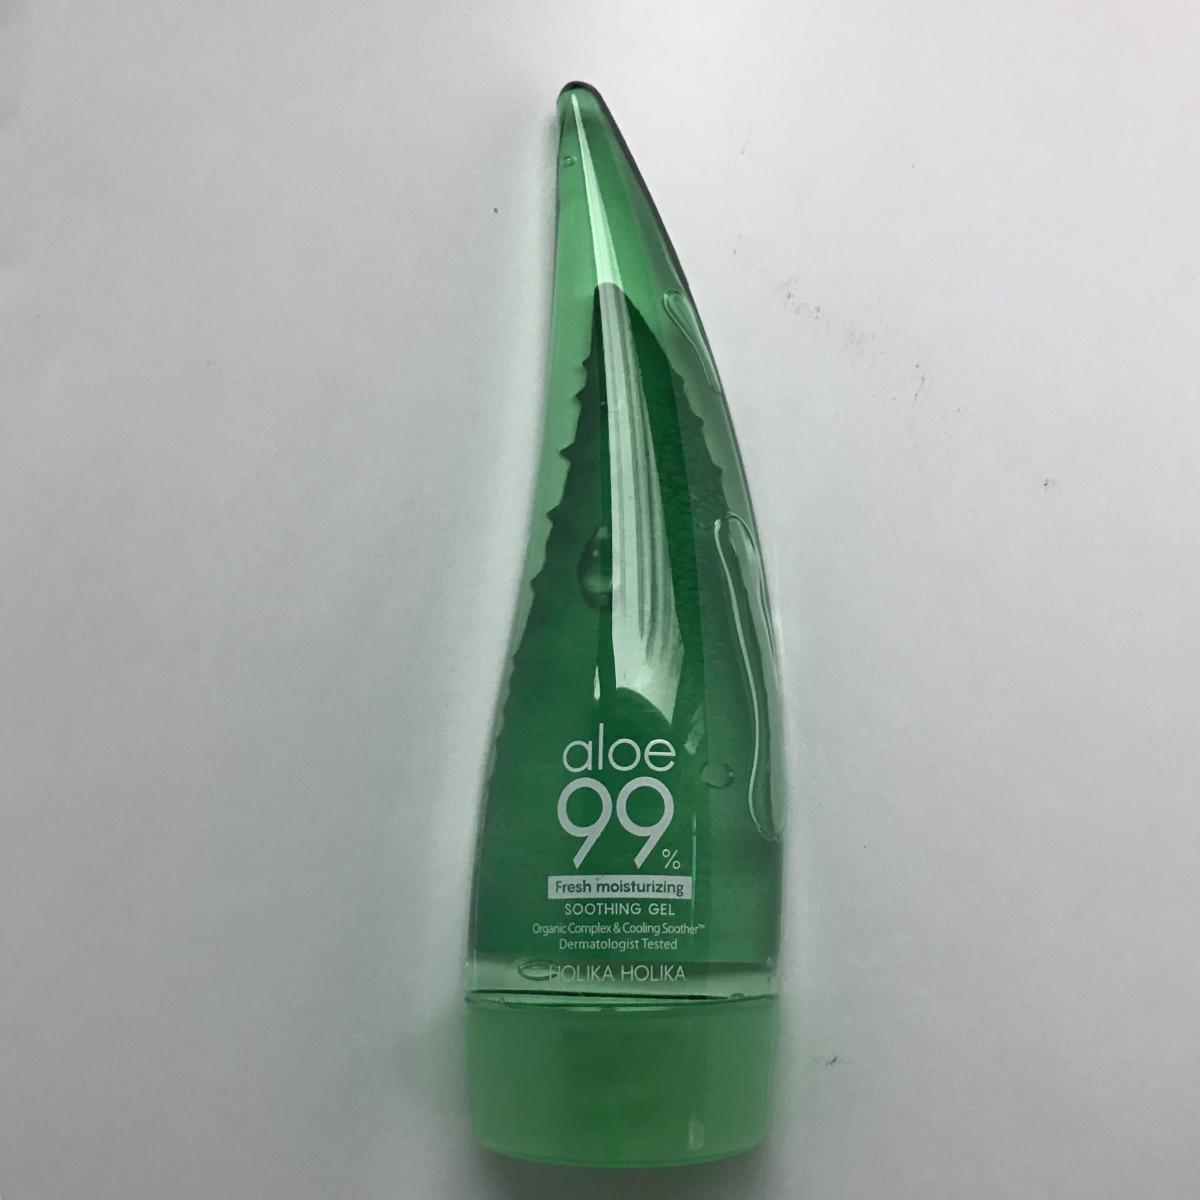 Гель с алоэ вера 99% успокаивающий Holika Holika Aloe 99% Fresh Soothing Gel 55Ml Ad - 55мл